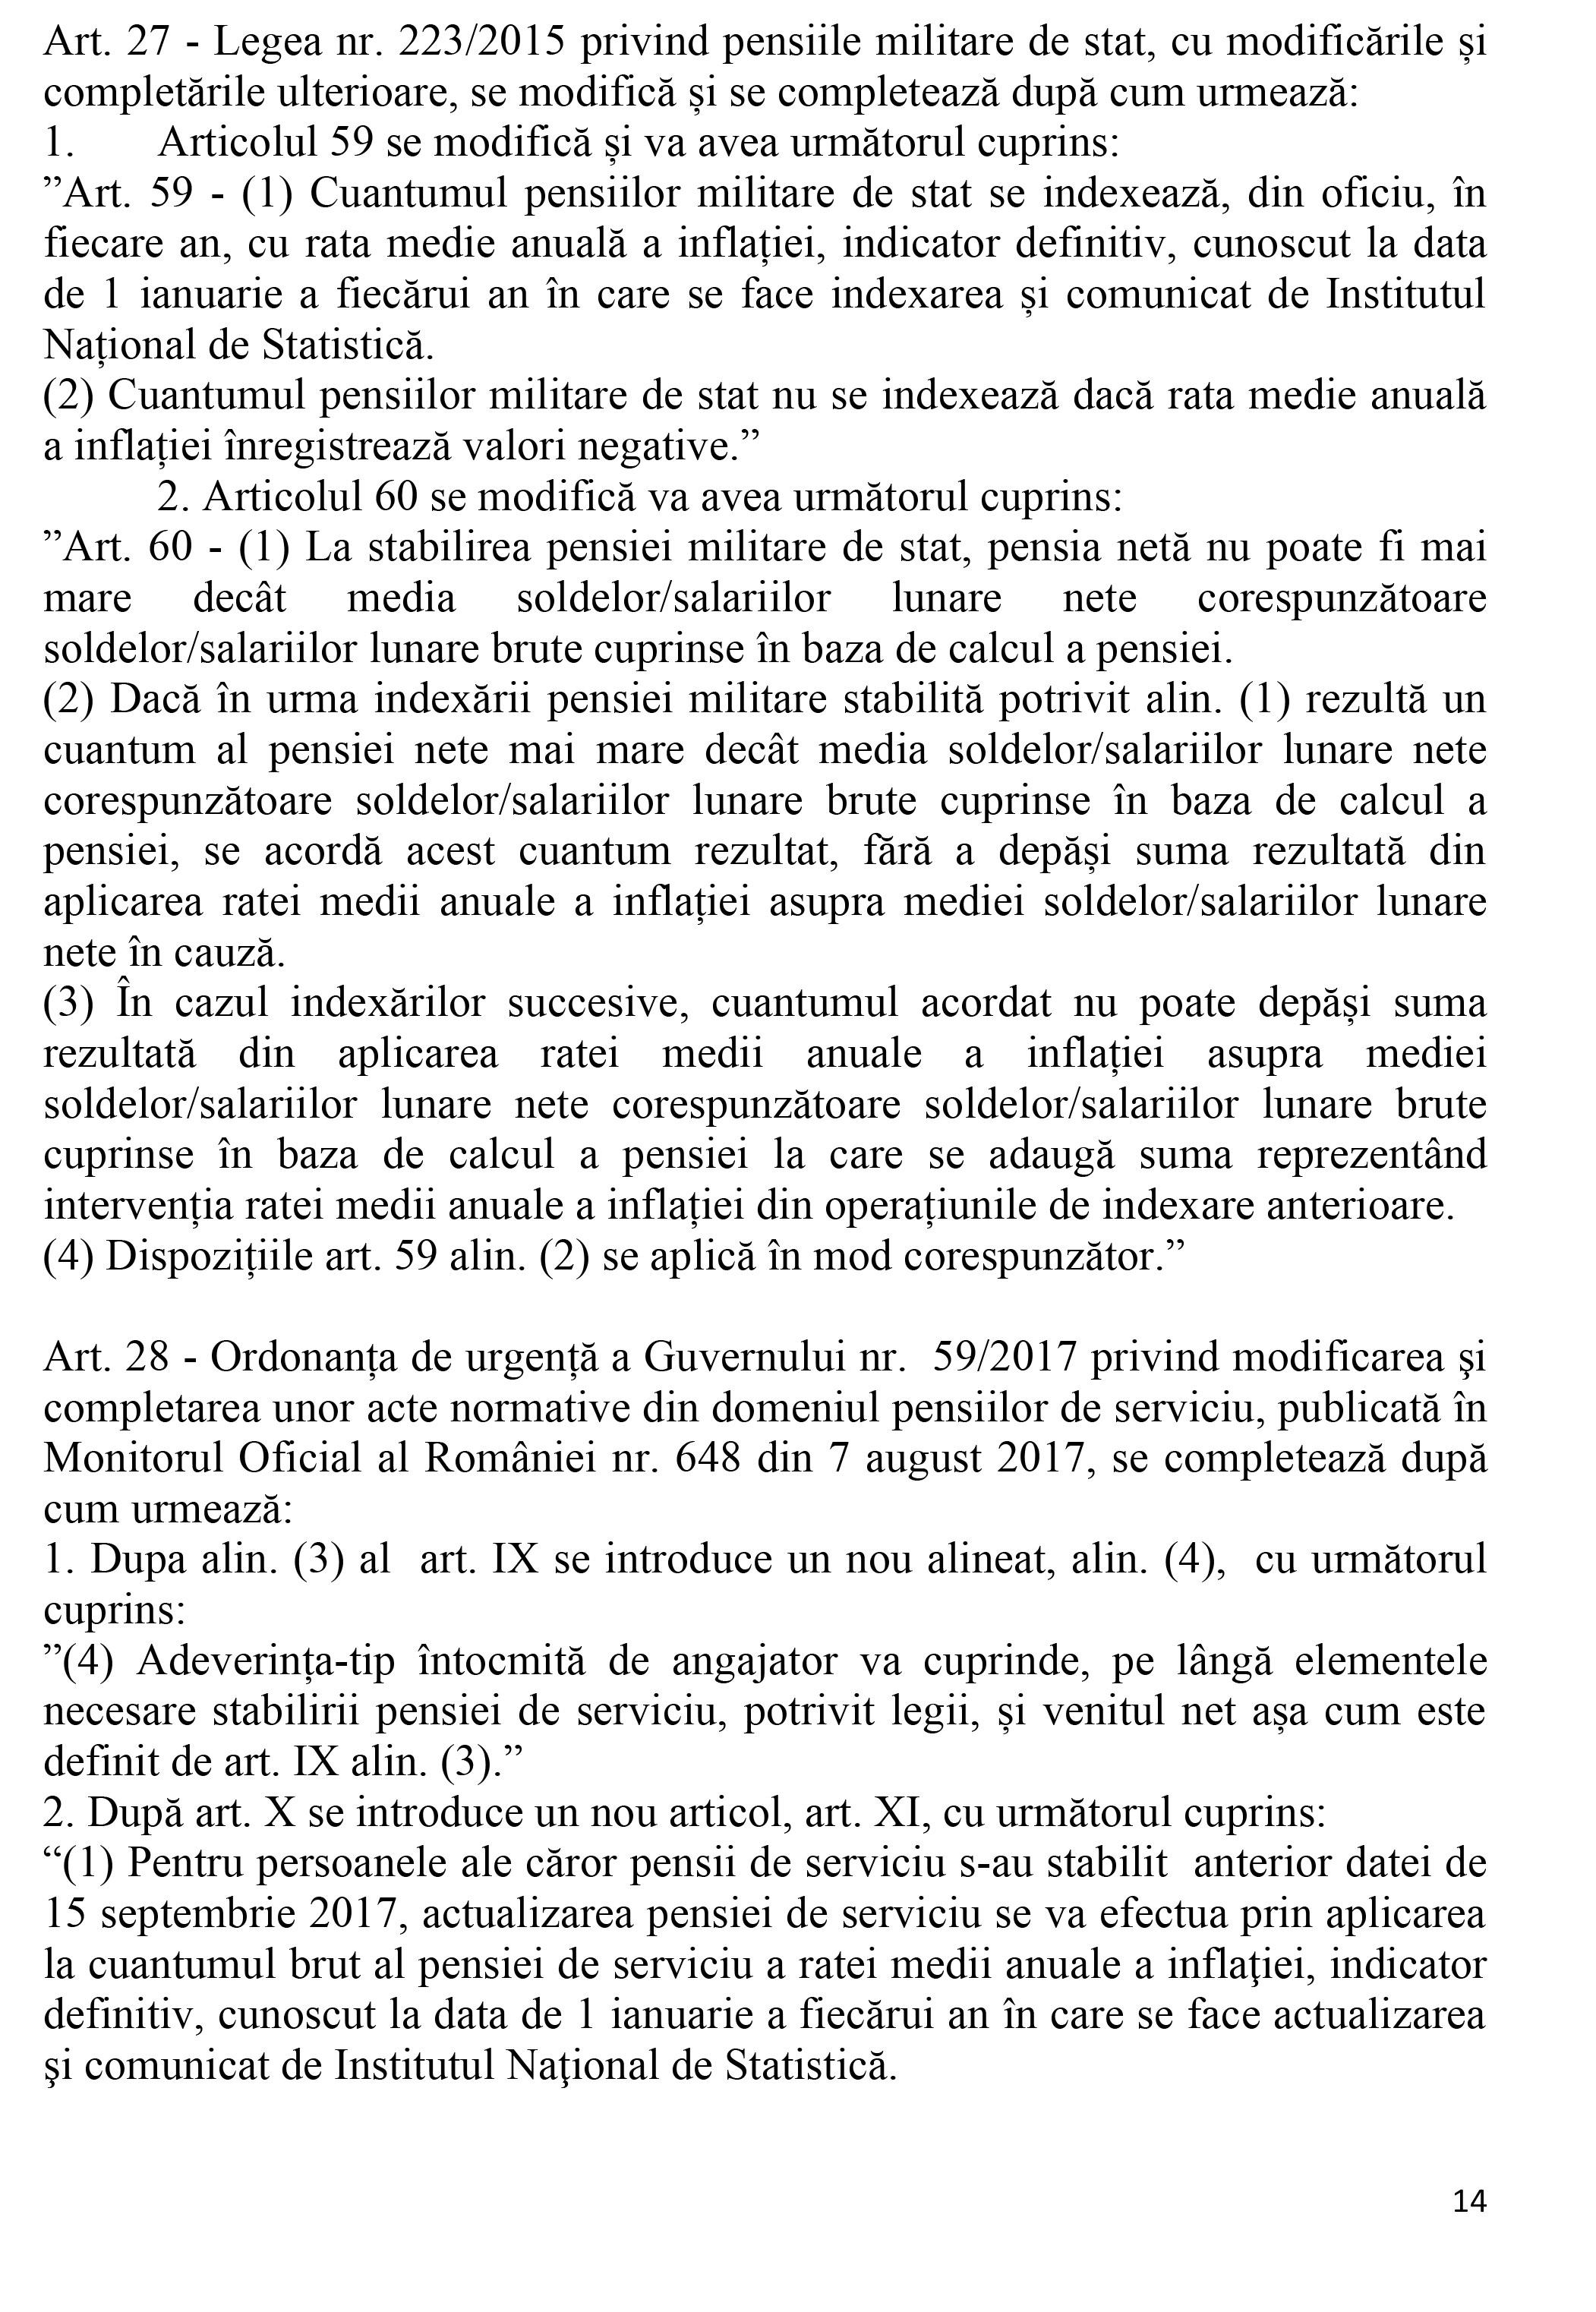 Microsoft Word - OUG masuri 4 dec ora 21.docx